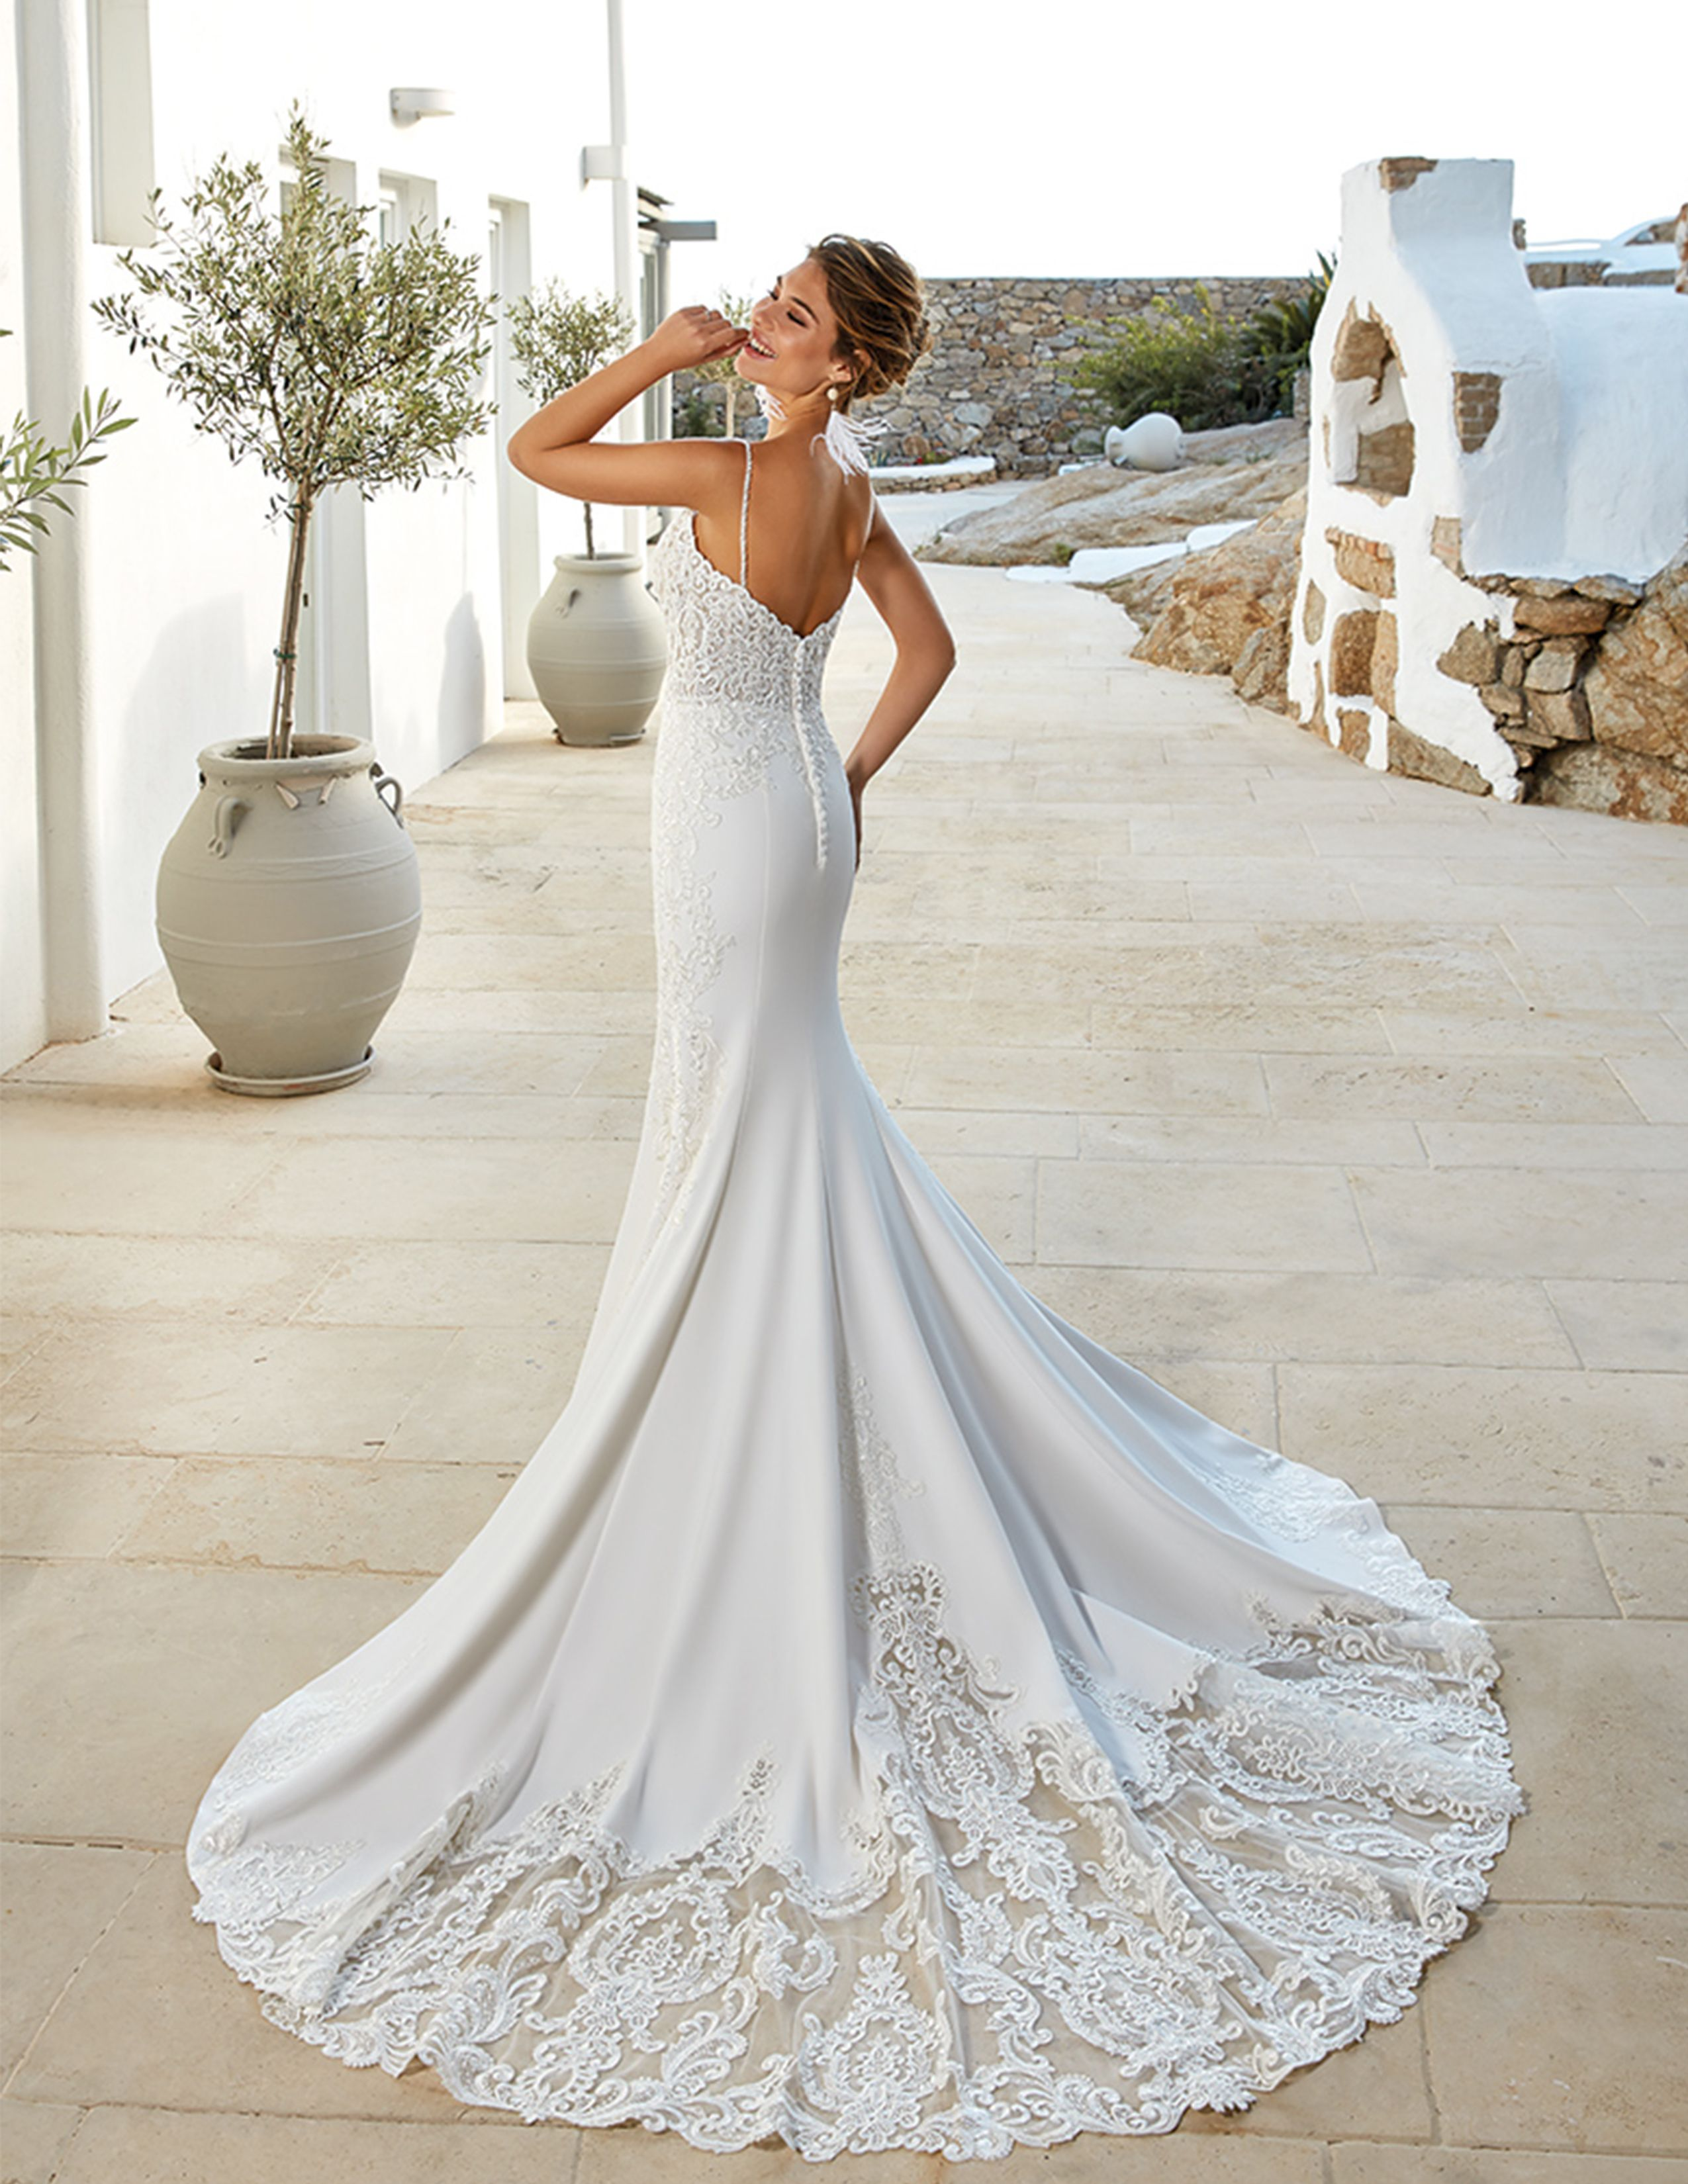 Wedding Dress Reina Seattle Wedding Dress Mermaid Wedding Dress Designer Bridal Gowns [ 3300 x 2550 Pixel ]